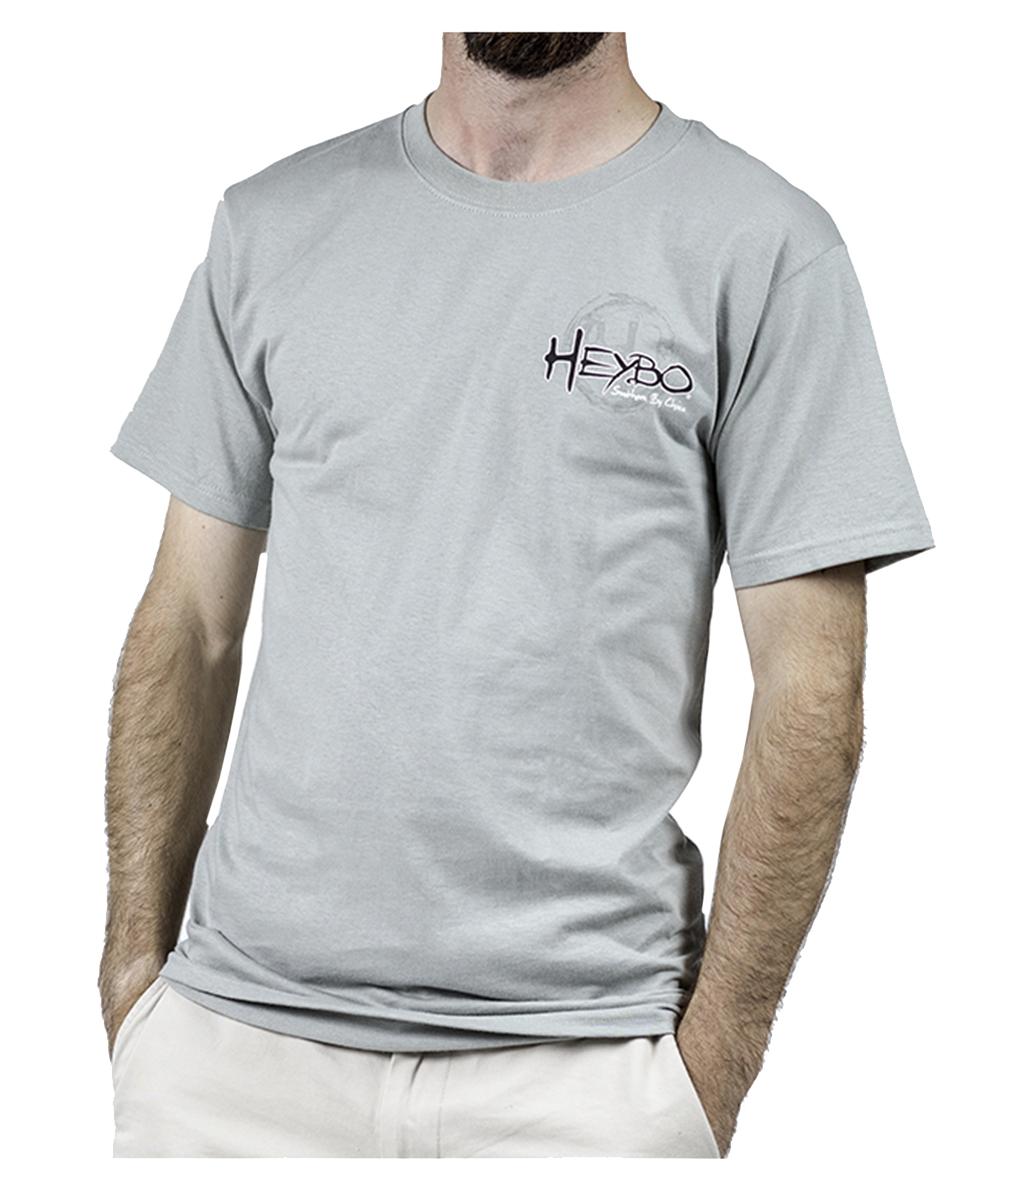 7095ef88 Heybo Trout Adult SS T Shirt | eBay